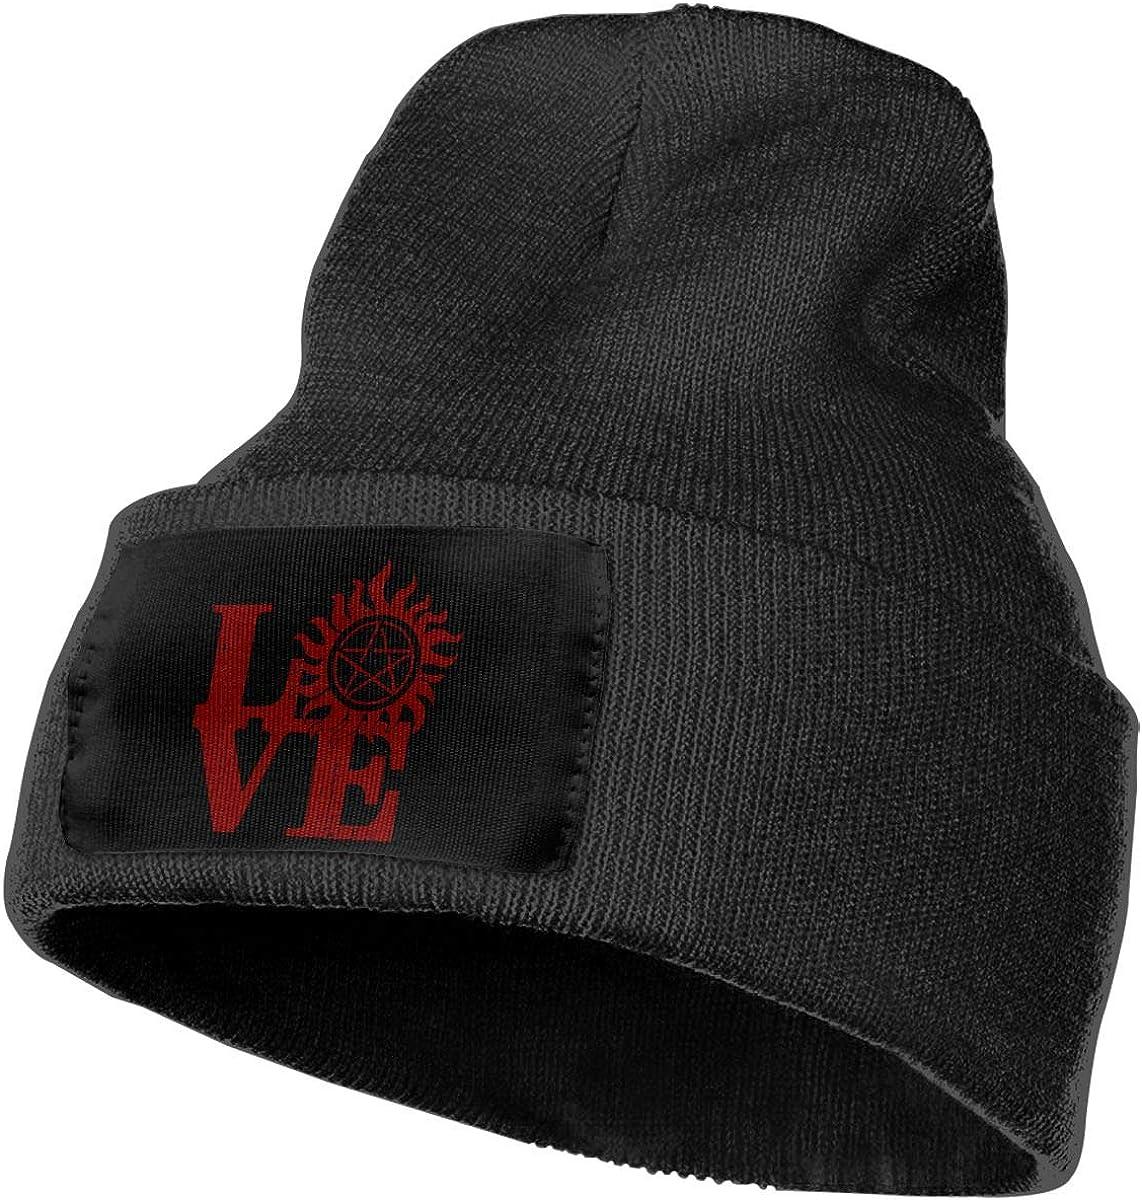 Love Supernatural Men /& Women Knit Hats Stretchy /& Soft Beanie Cap Hat Beanie